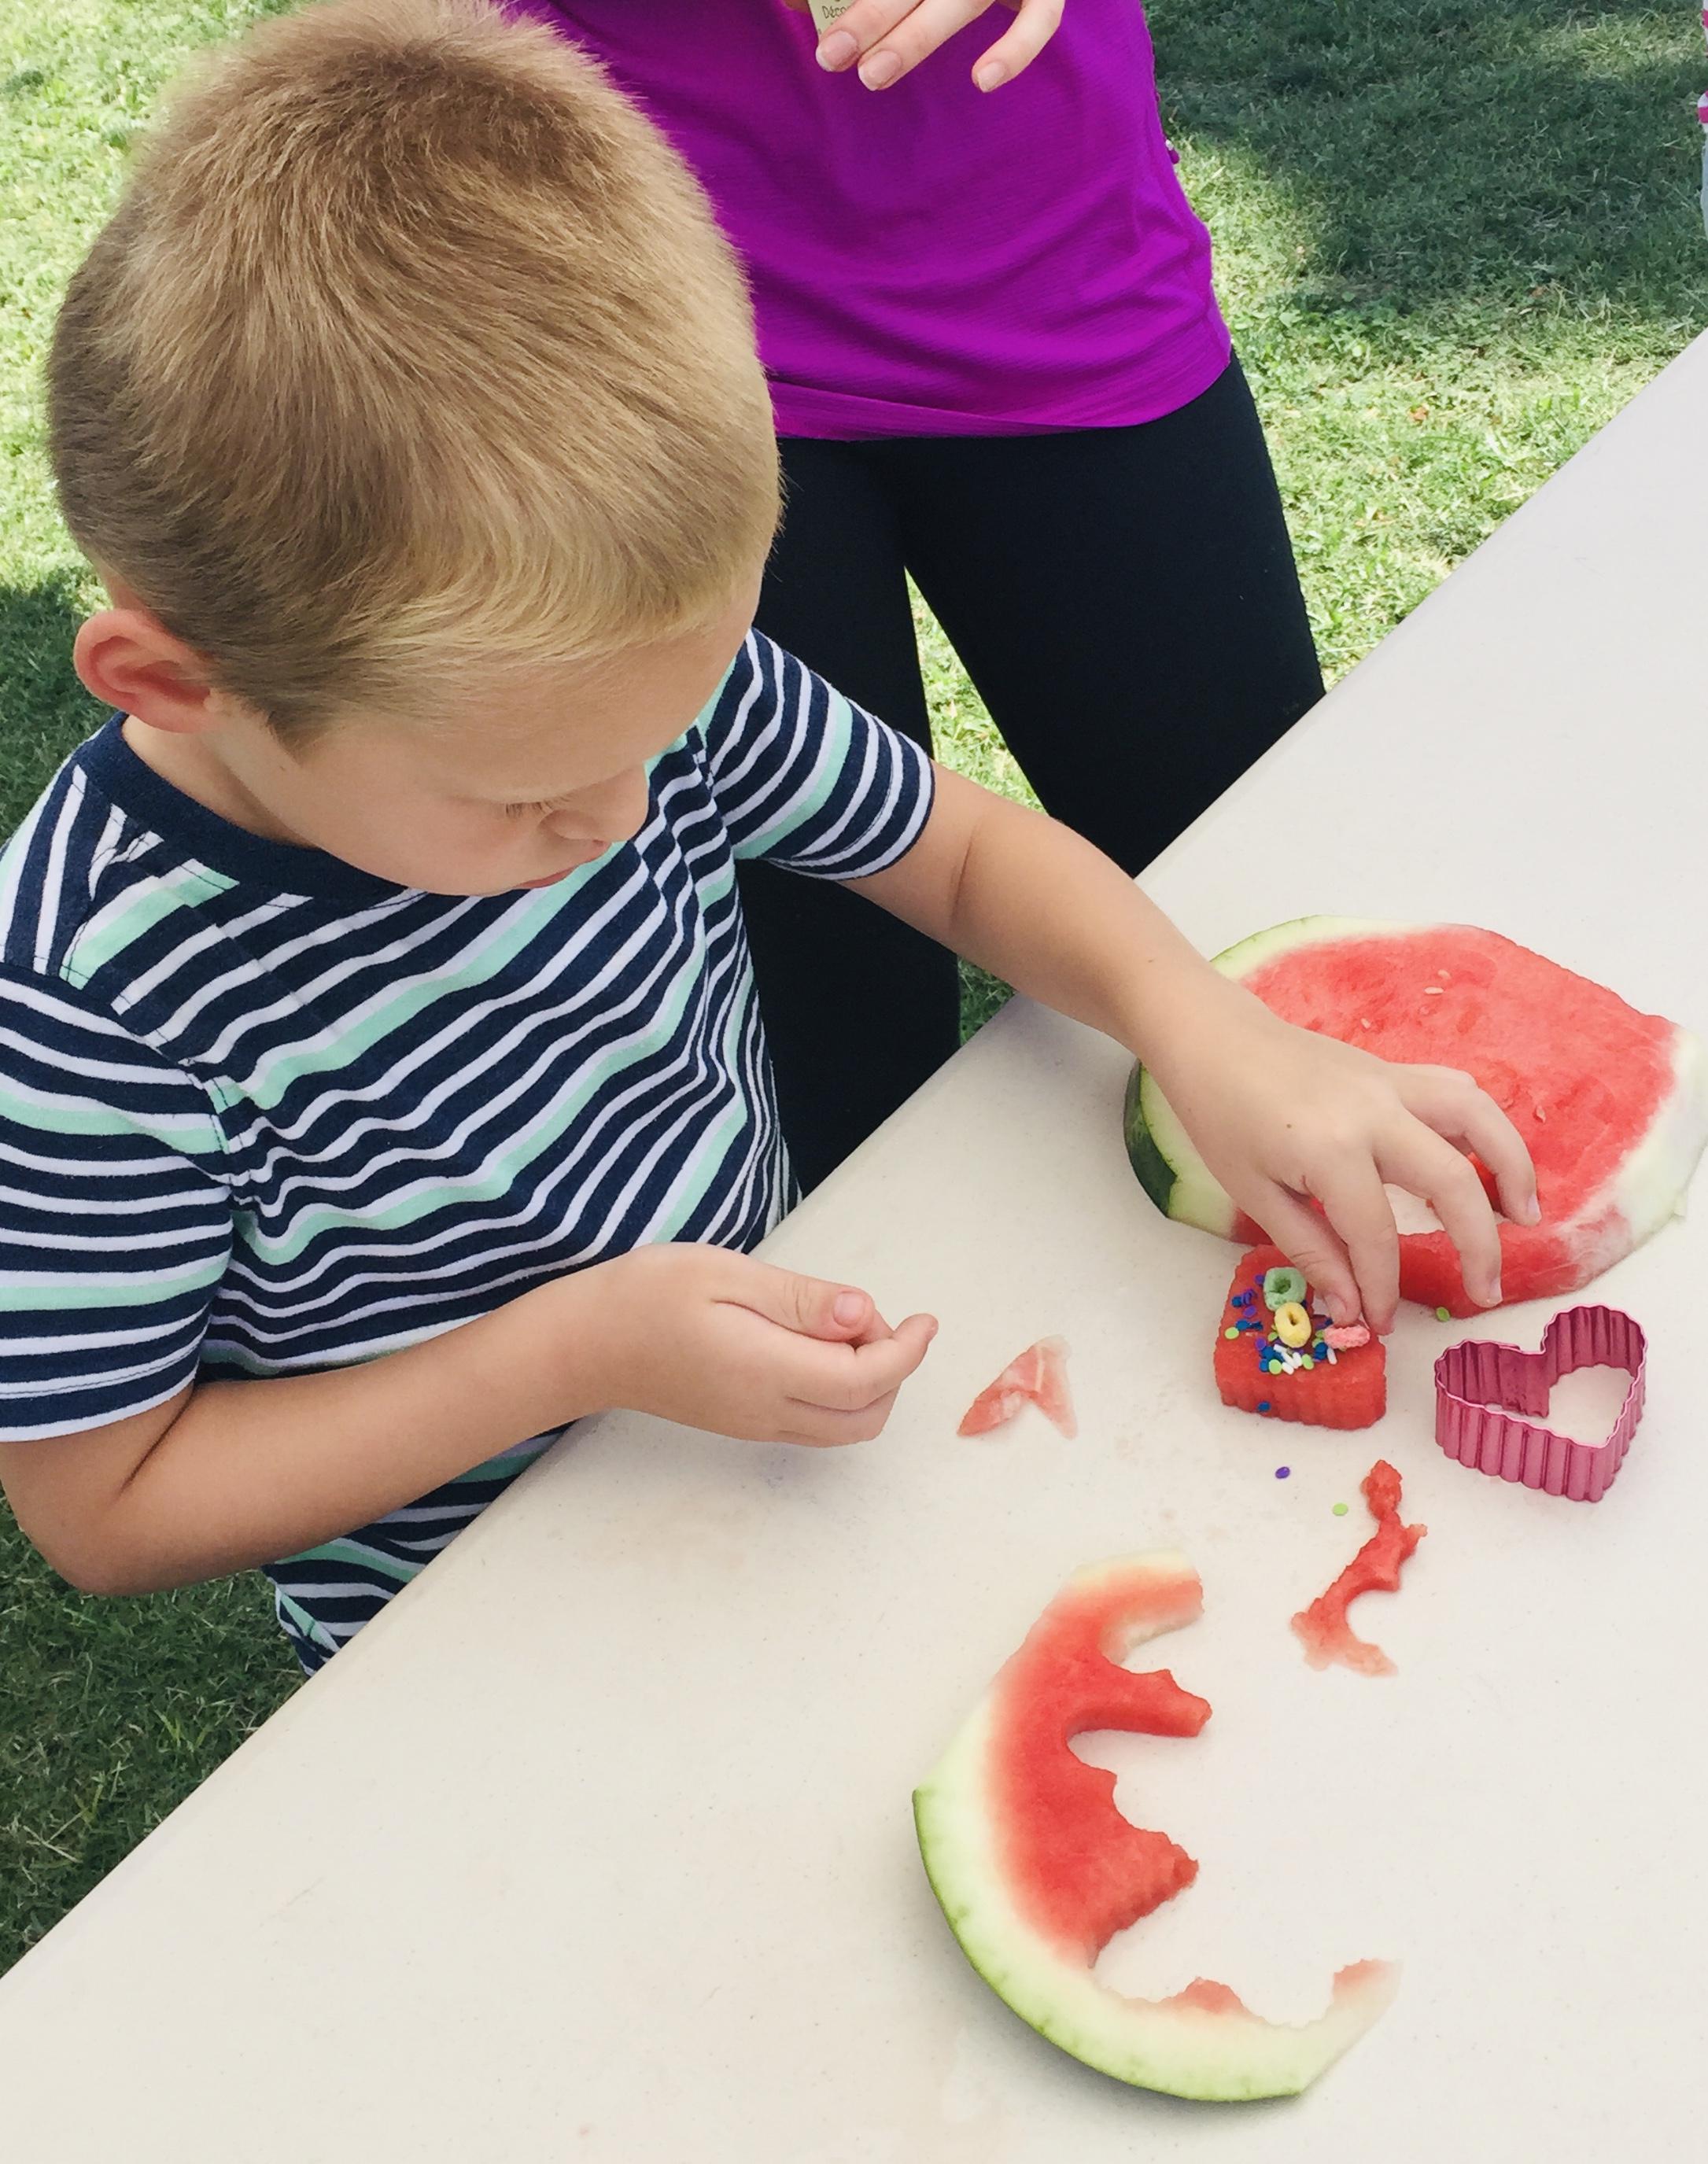 Kid placing Fruit Loops on watermelon heart